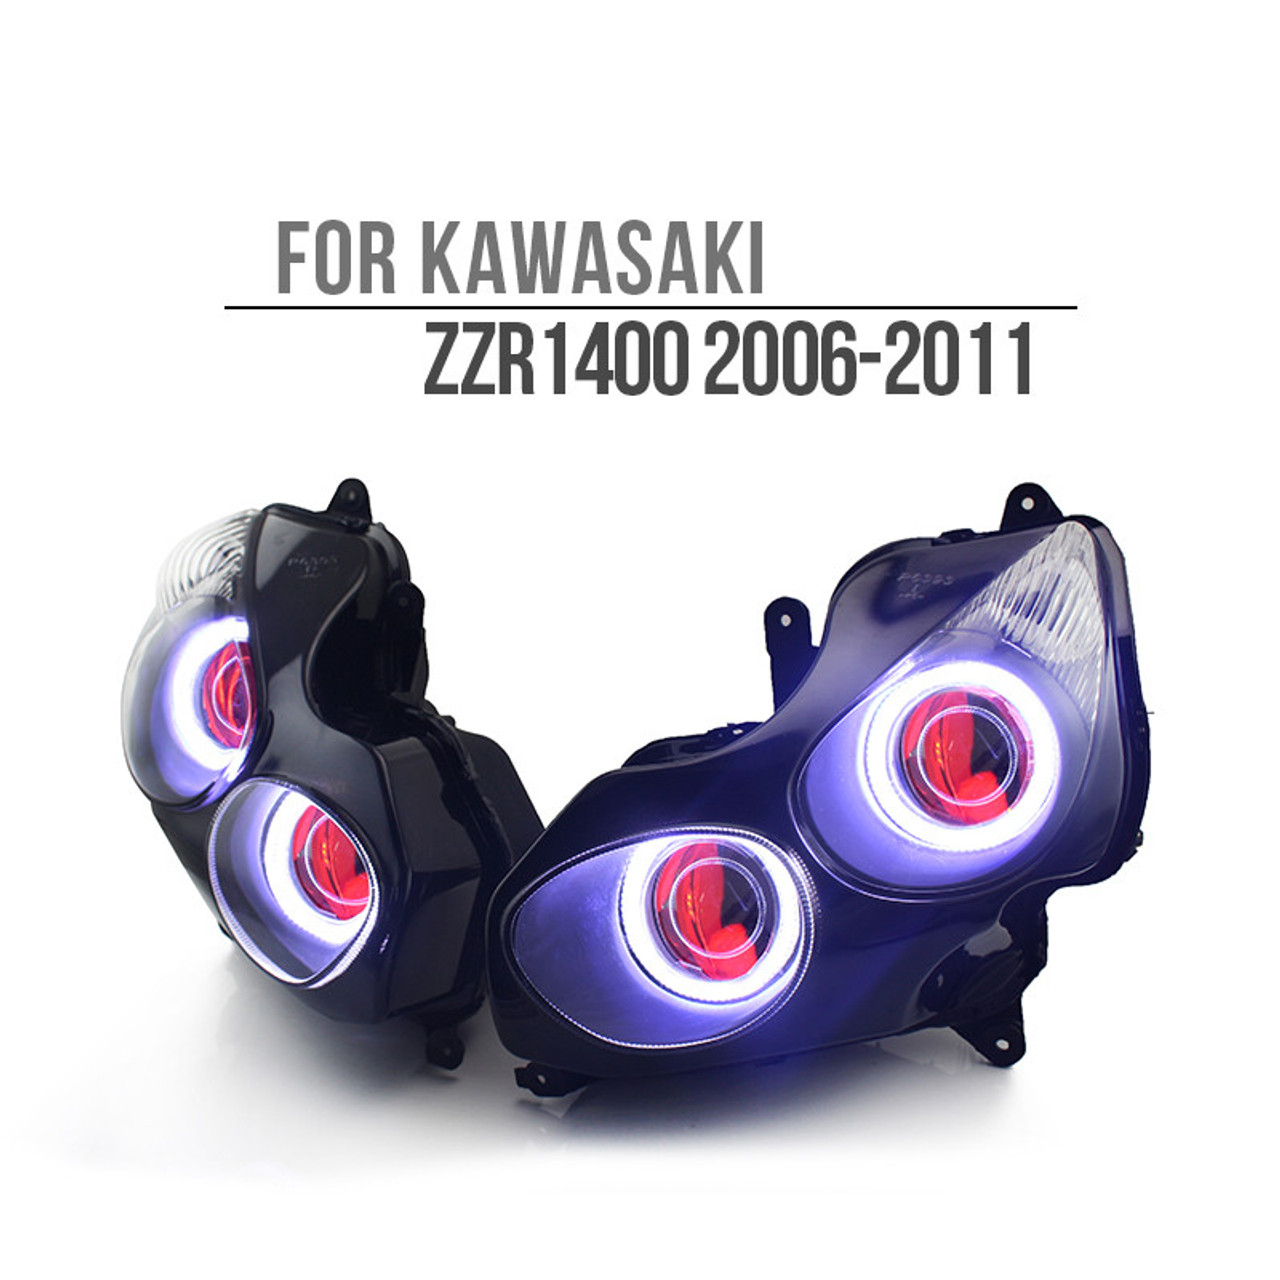 hight resolution of wiring harness 2008 zx14 wiring diagram insidekawasaki zx14r zzr1400 headlight 2006 2007 2008 2009 2010 2011